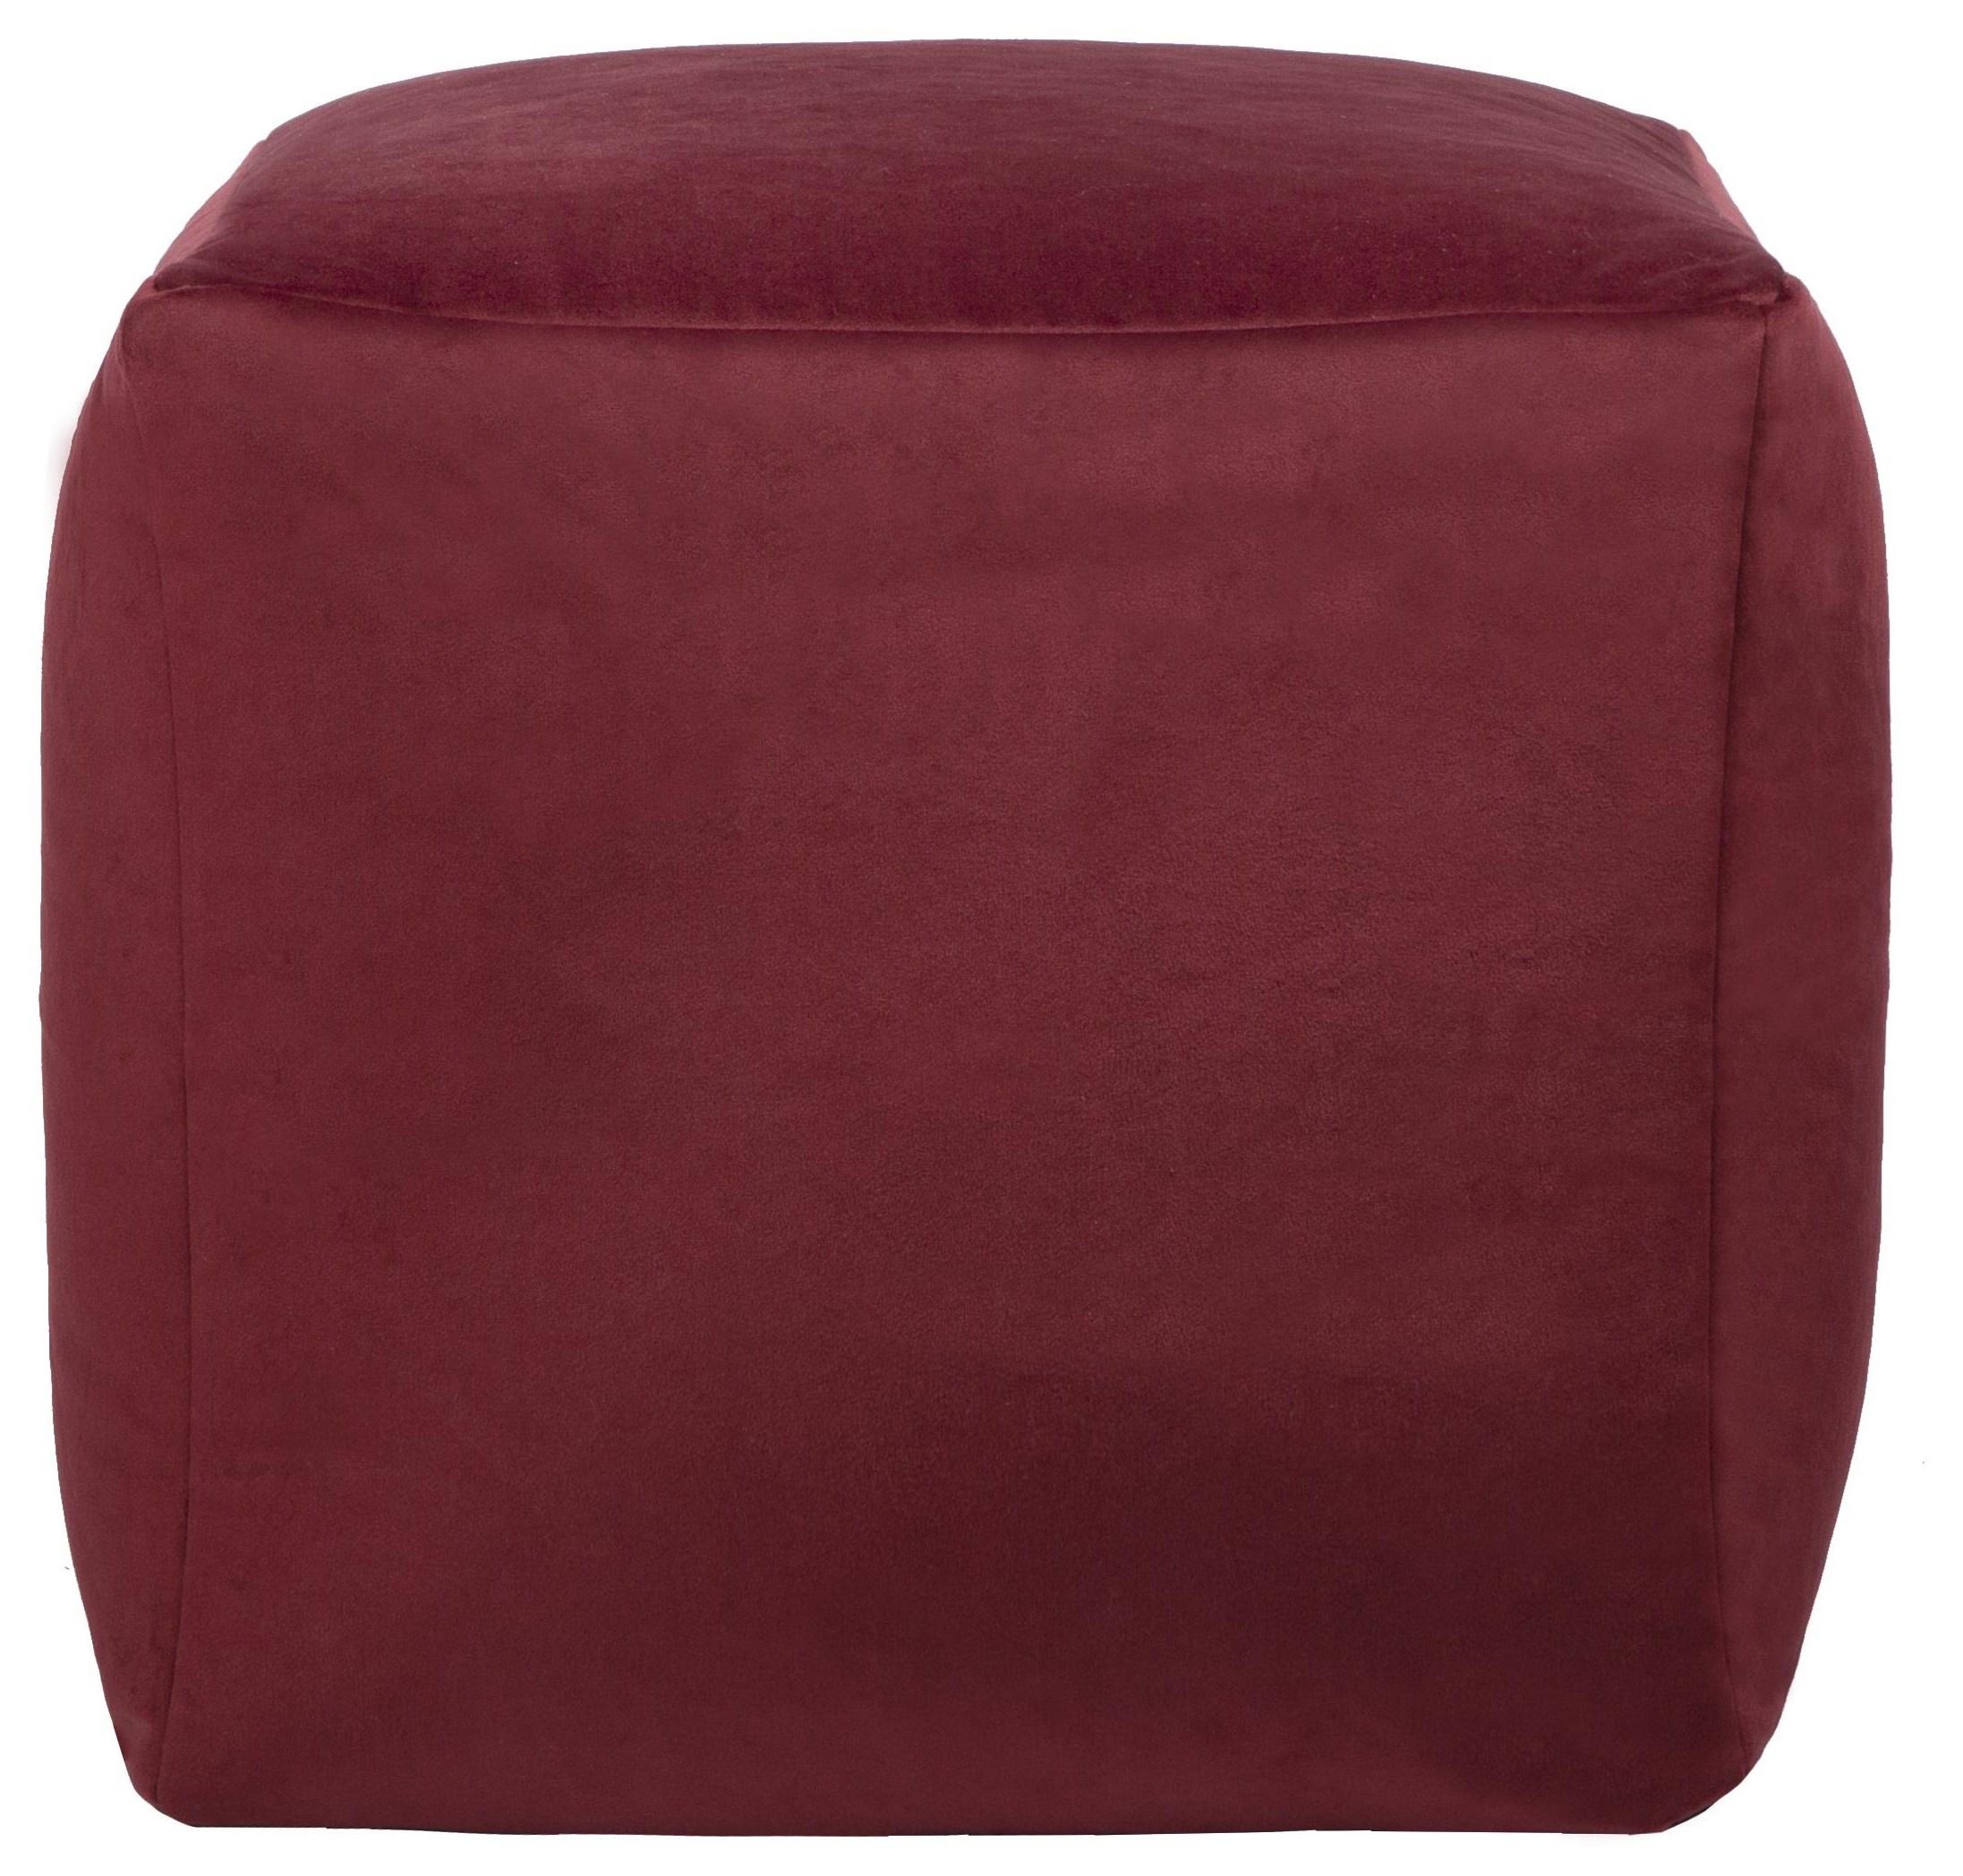 Red Cube Beanbag